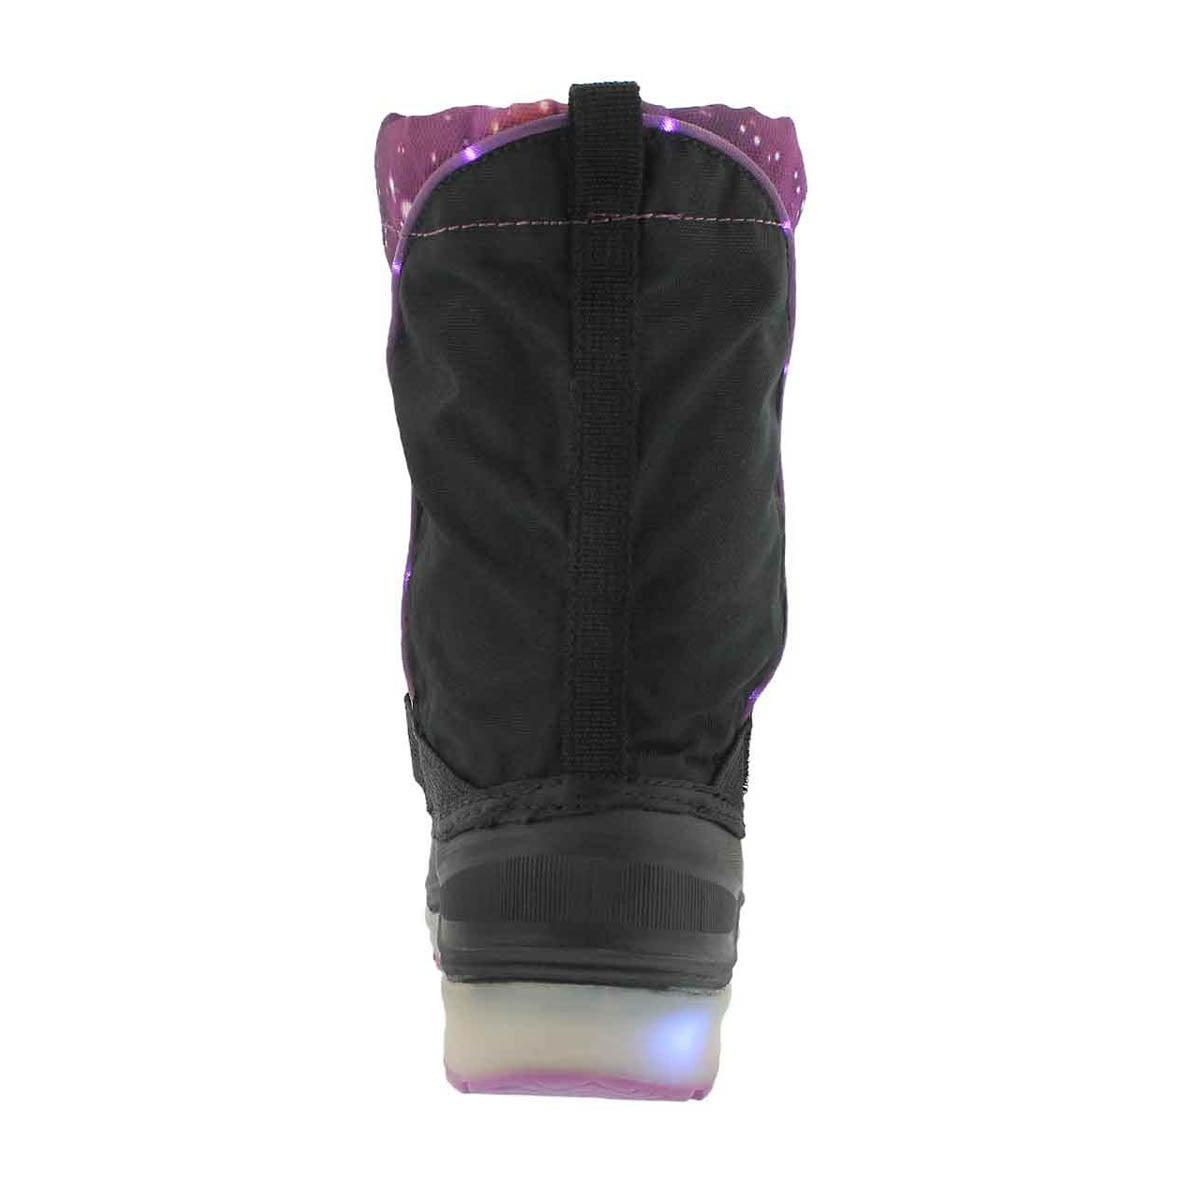 Grls Cosmos ppl wp light up winter boot